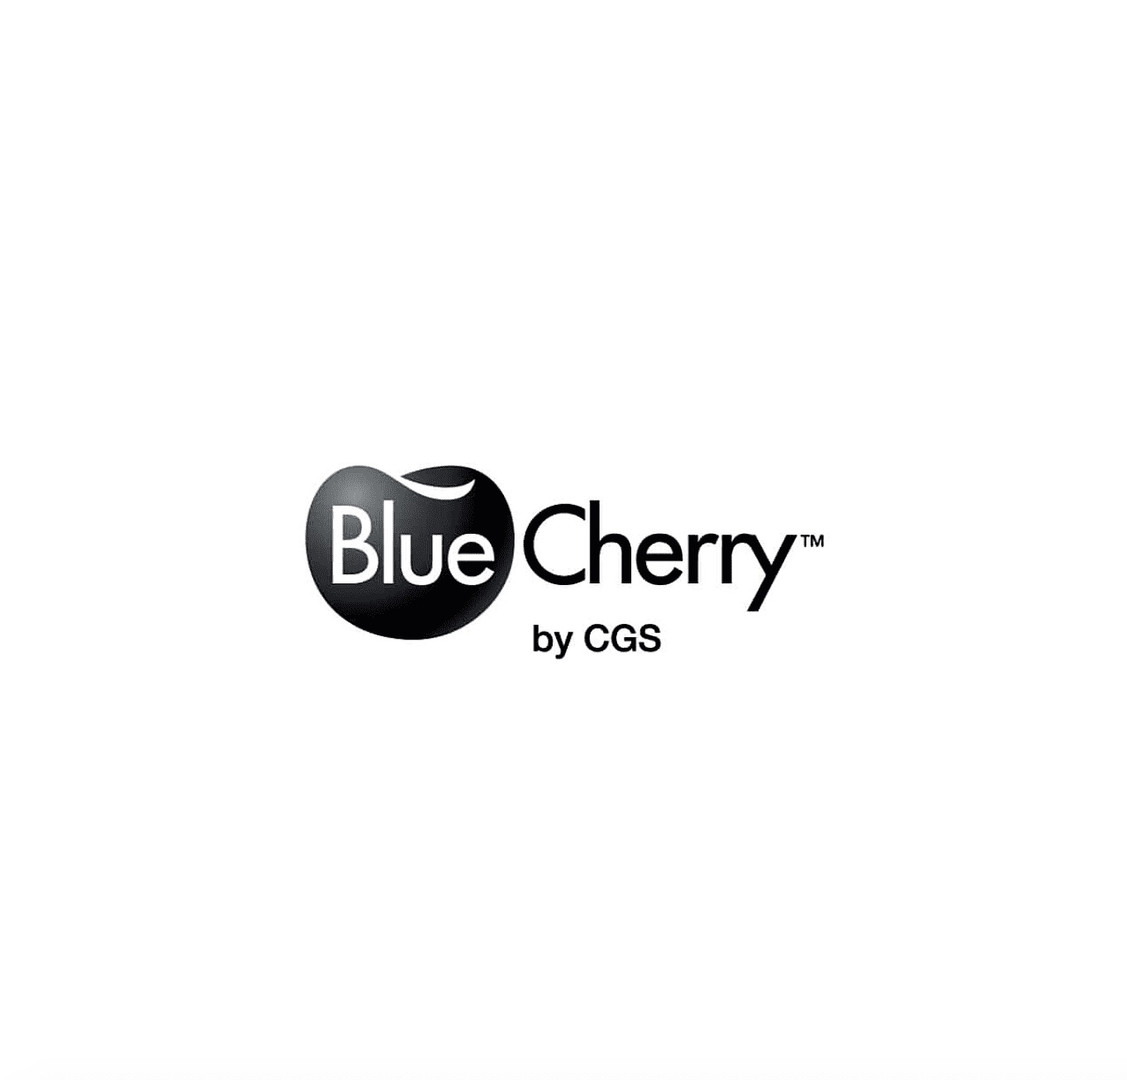 BlueCherry-compressed_edited.jpg